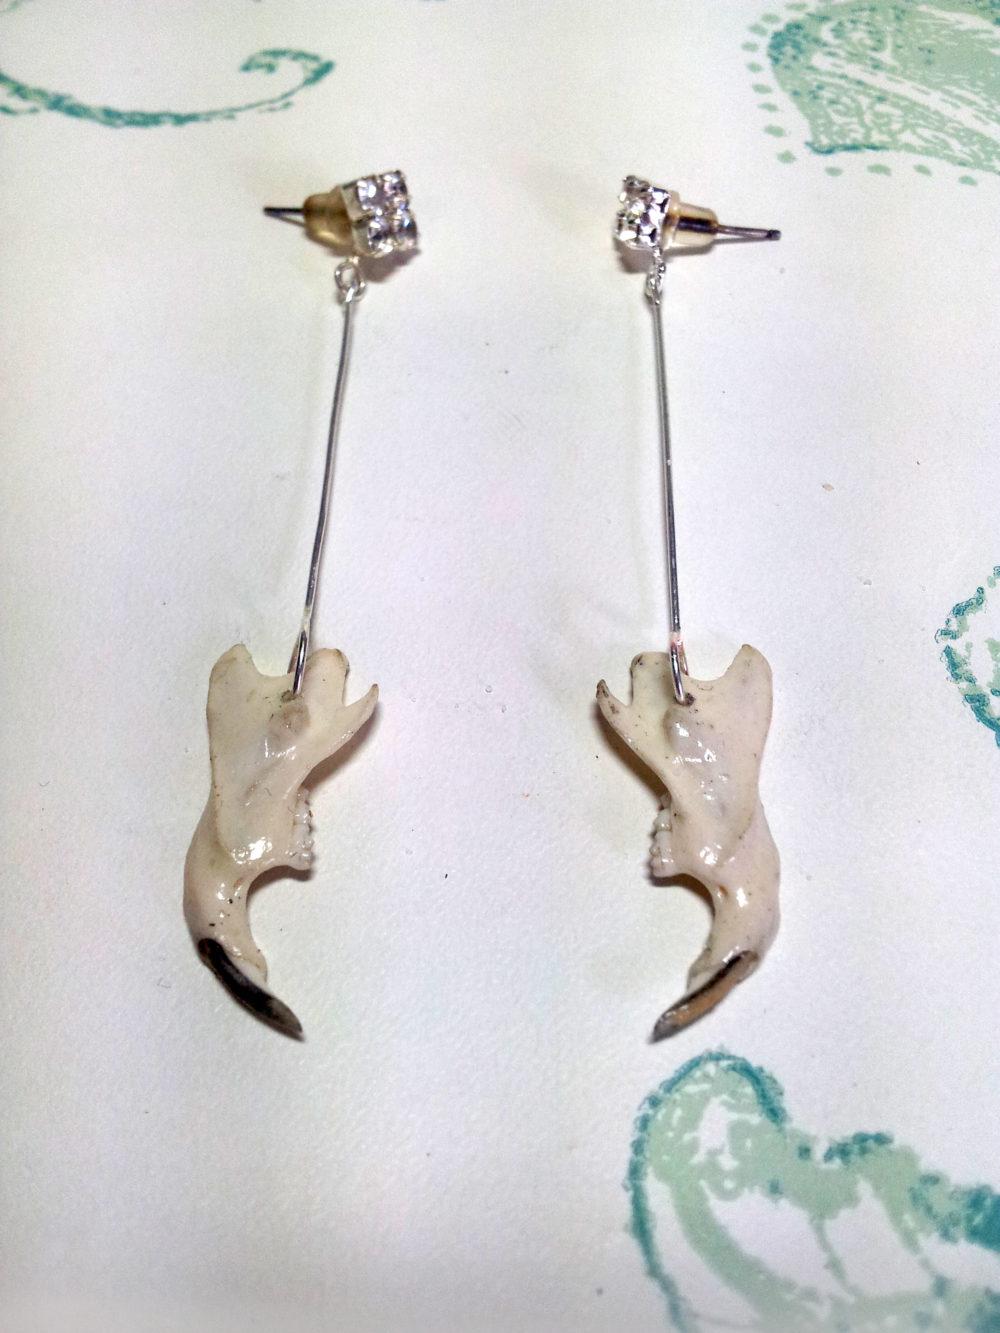 Jaws of Ratatoski